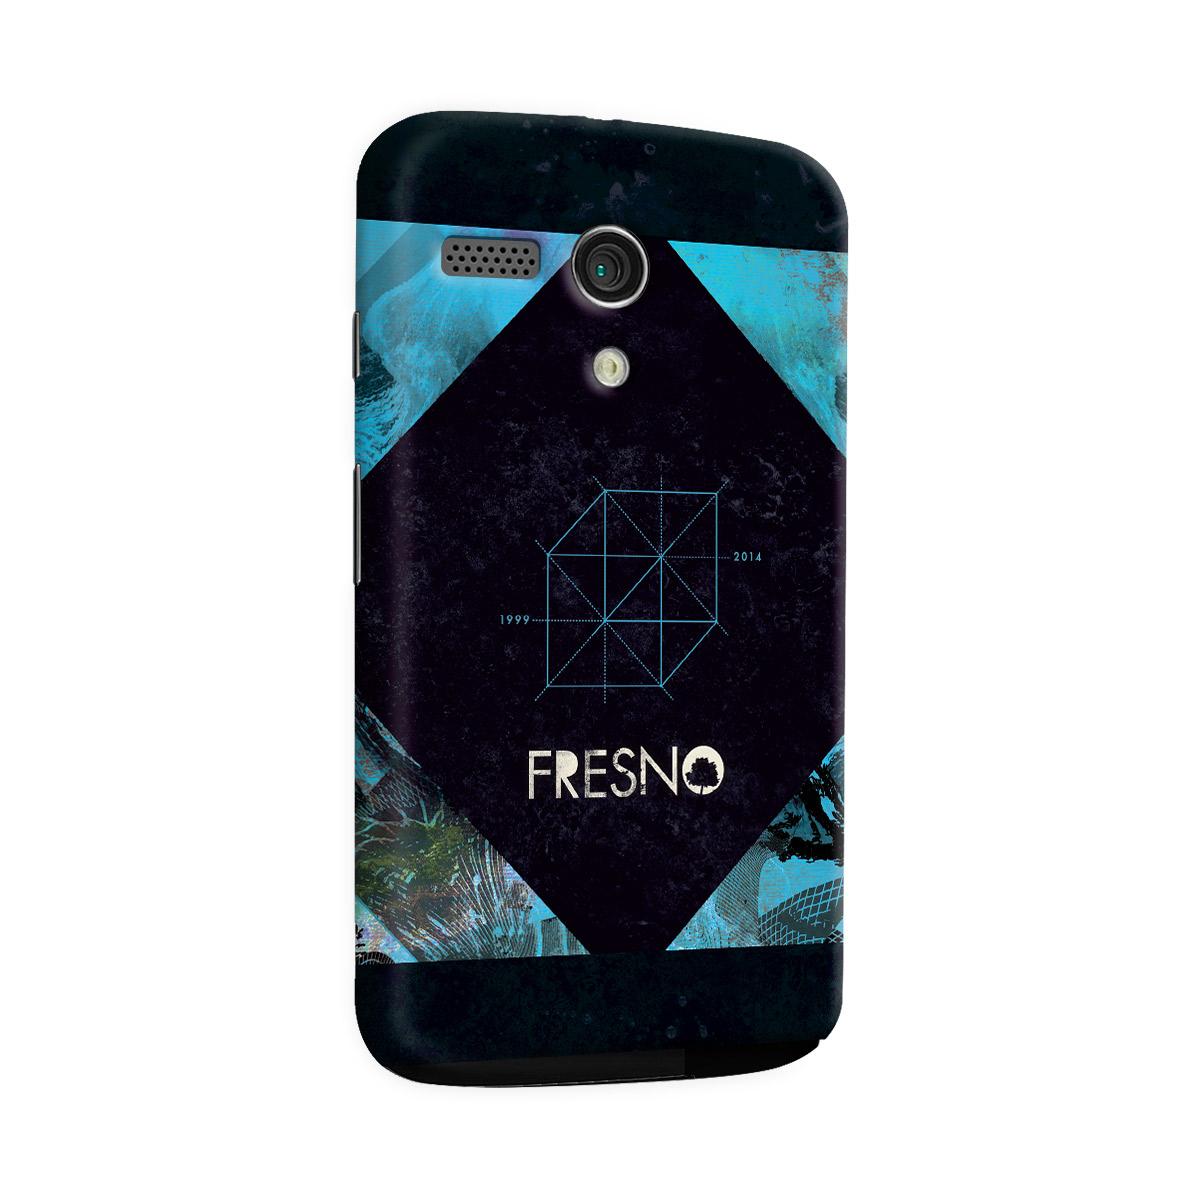 Capa para Motorola Moto G 1 Fresno Capa Deluxe